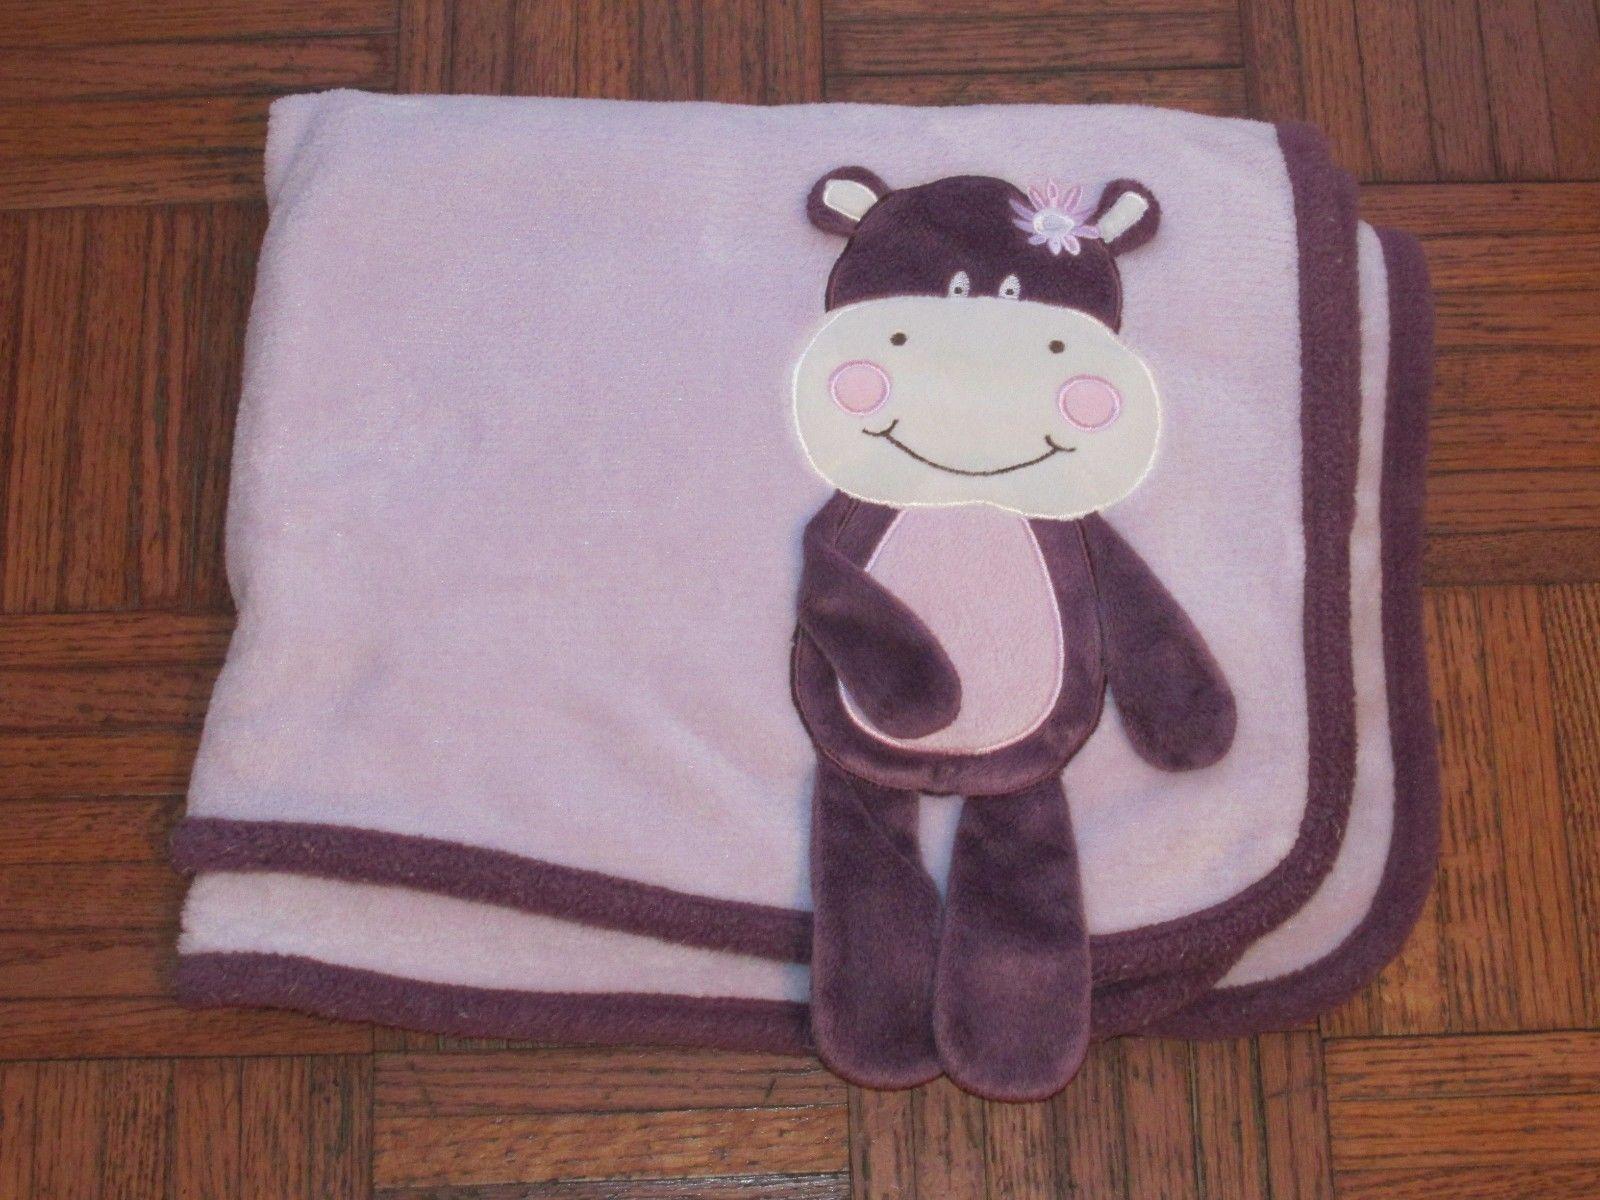 a8d3dd5e6 Koala Baby Babies R Us Lilac Purple Hippo and 50 similar items. S l1600